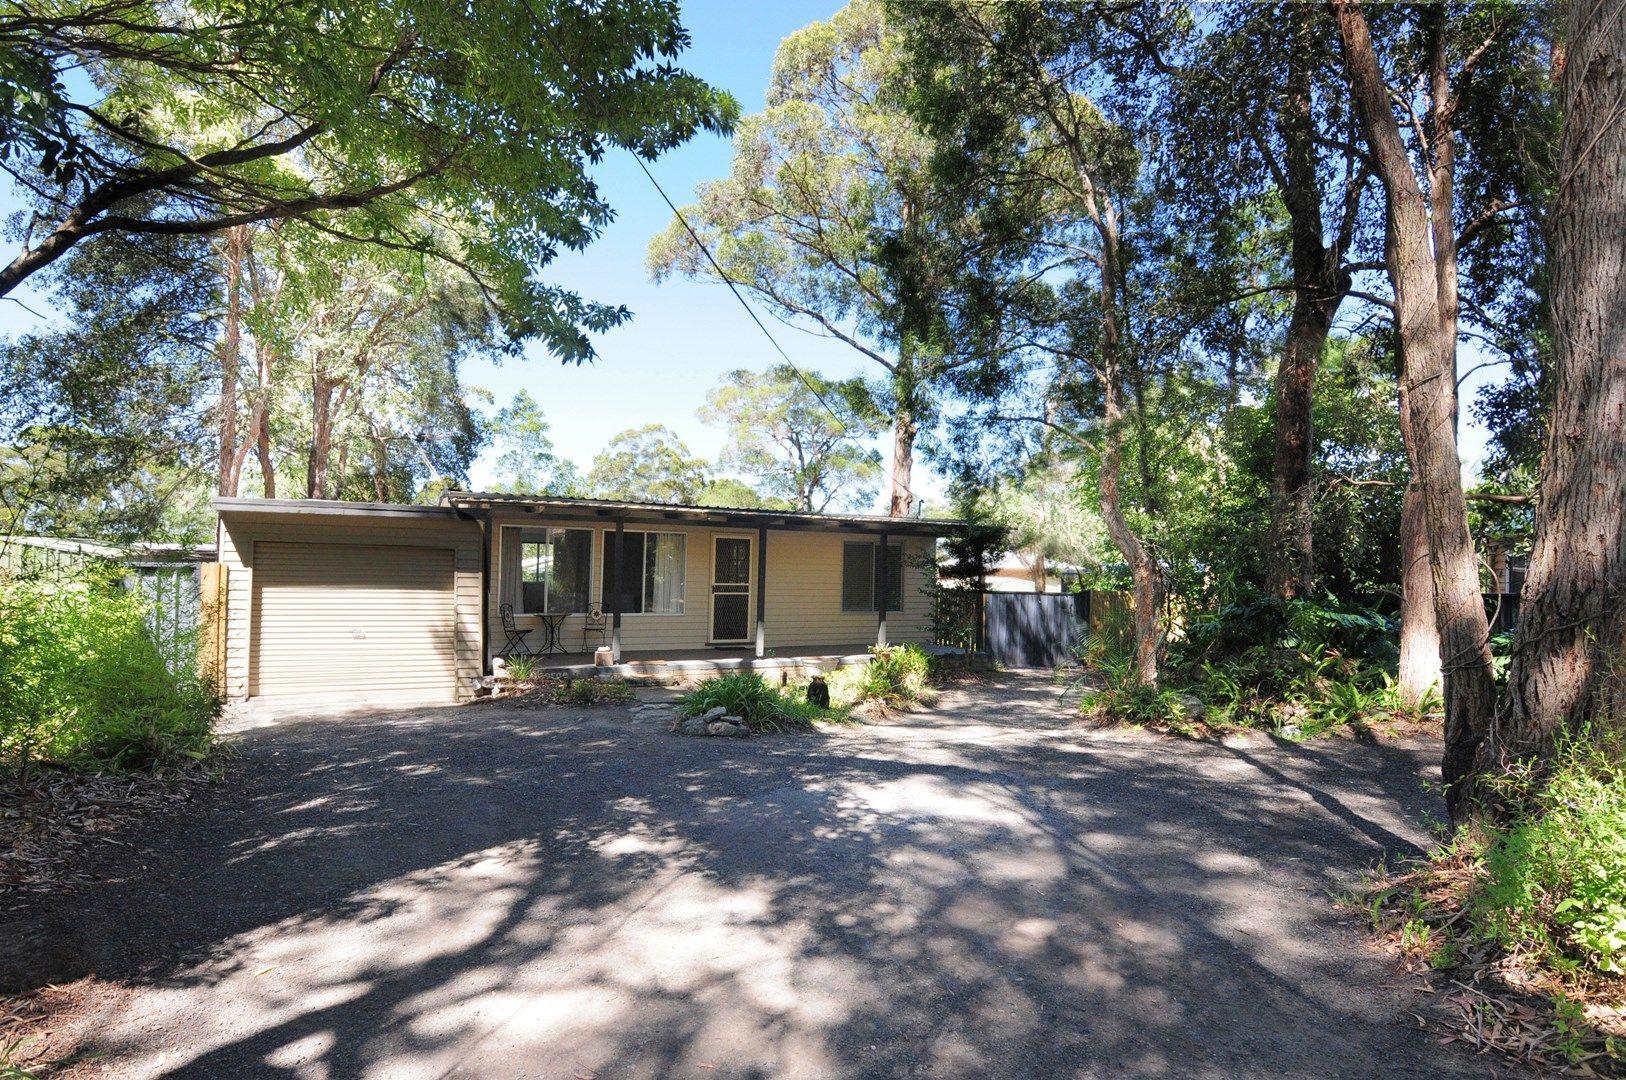 156 Tallyan Point Road, Basin View NSW 2540, Image 0